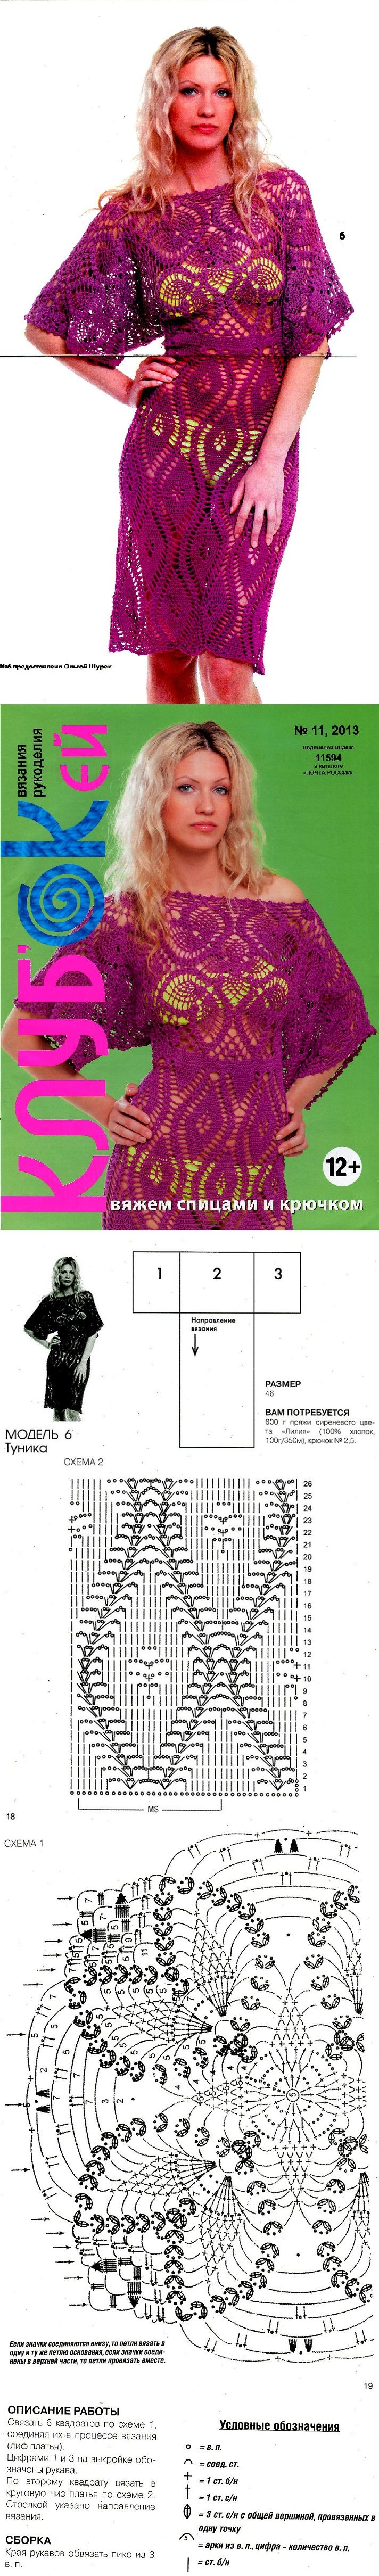 КЛУБ'ОКЕЙ №11 2013. http://www.liveinternet.ru/users/zhivaya_reka/post285822402/#      http://vk.com/wall-20078137?offset=2100